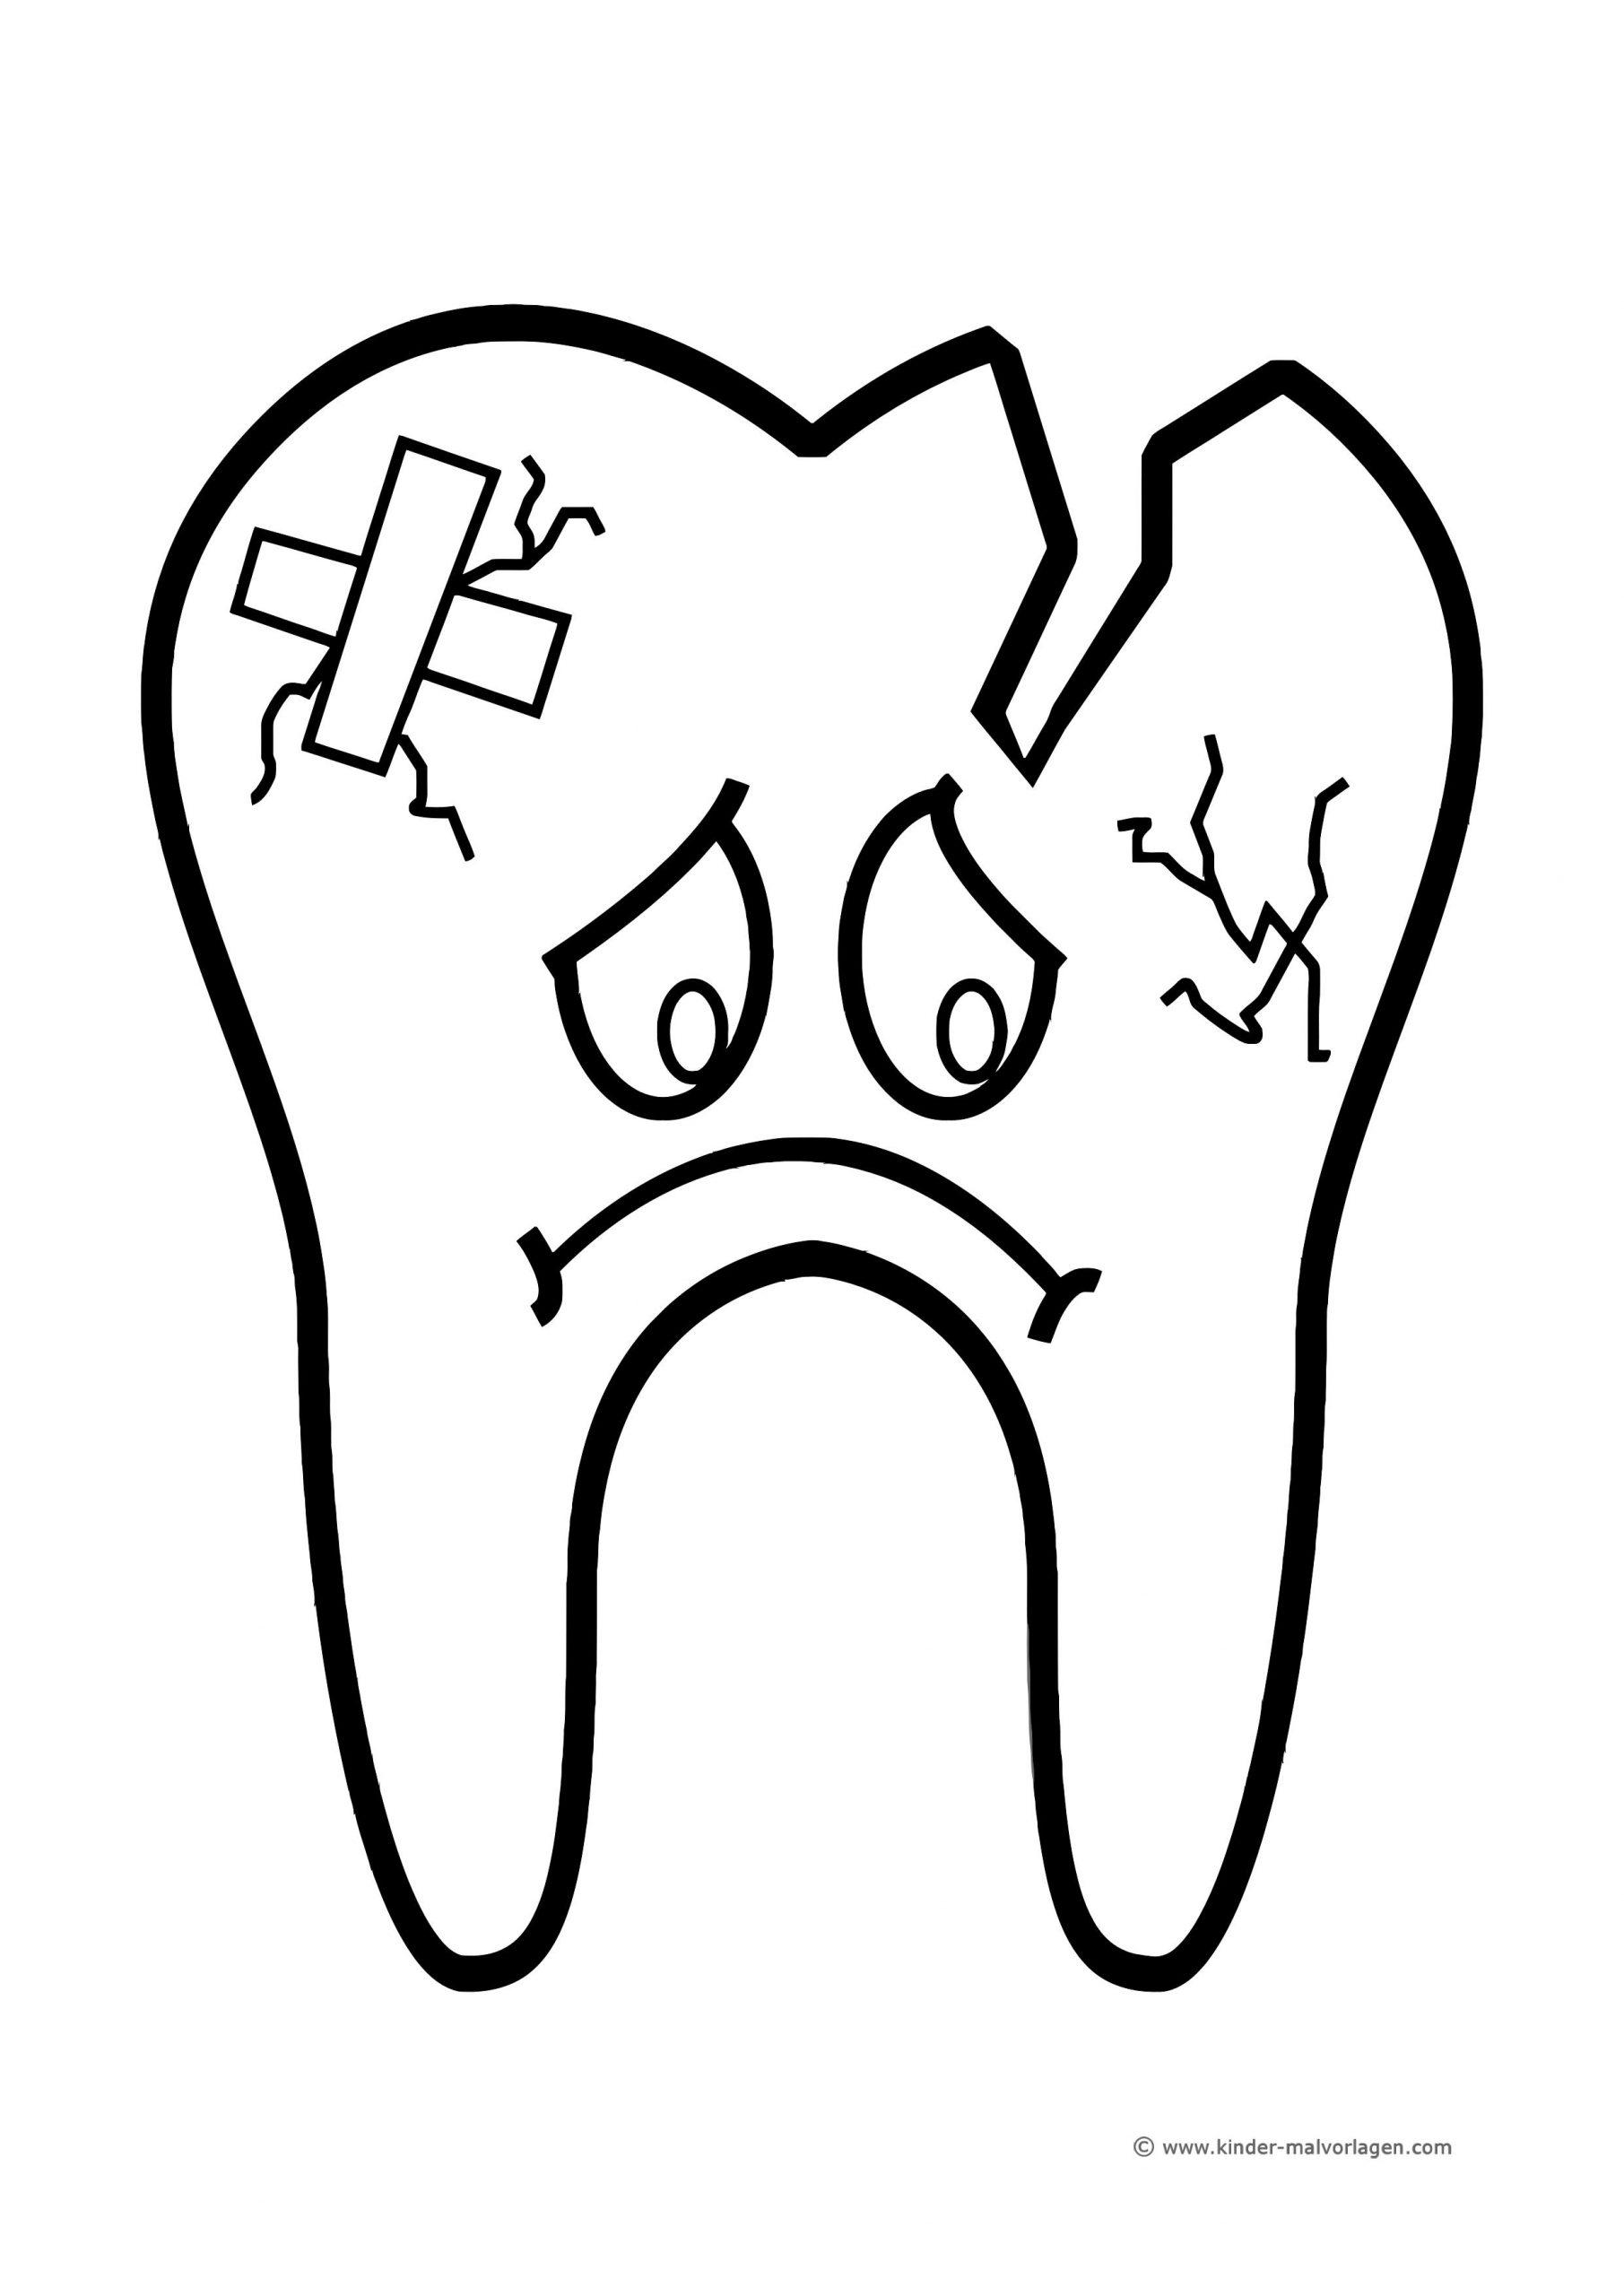 Lagz Rheinland-Pfalz über Ausmalbild Zahn